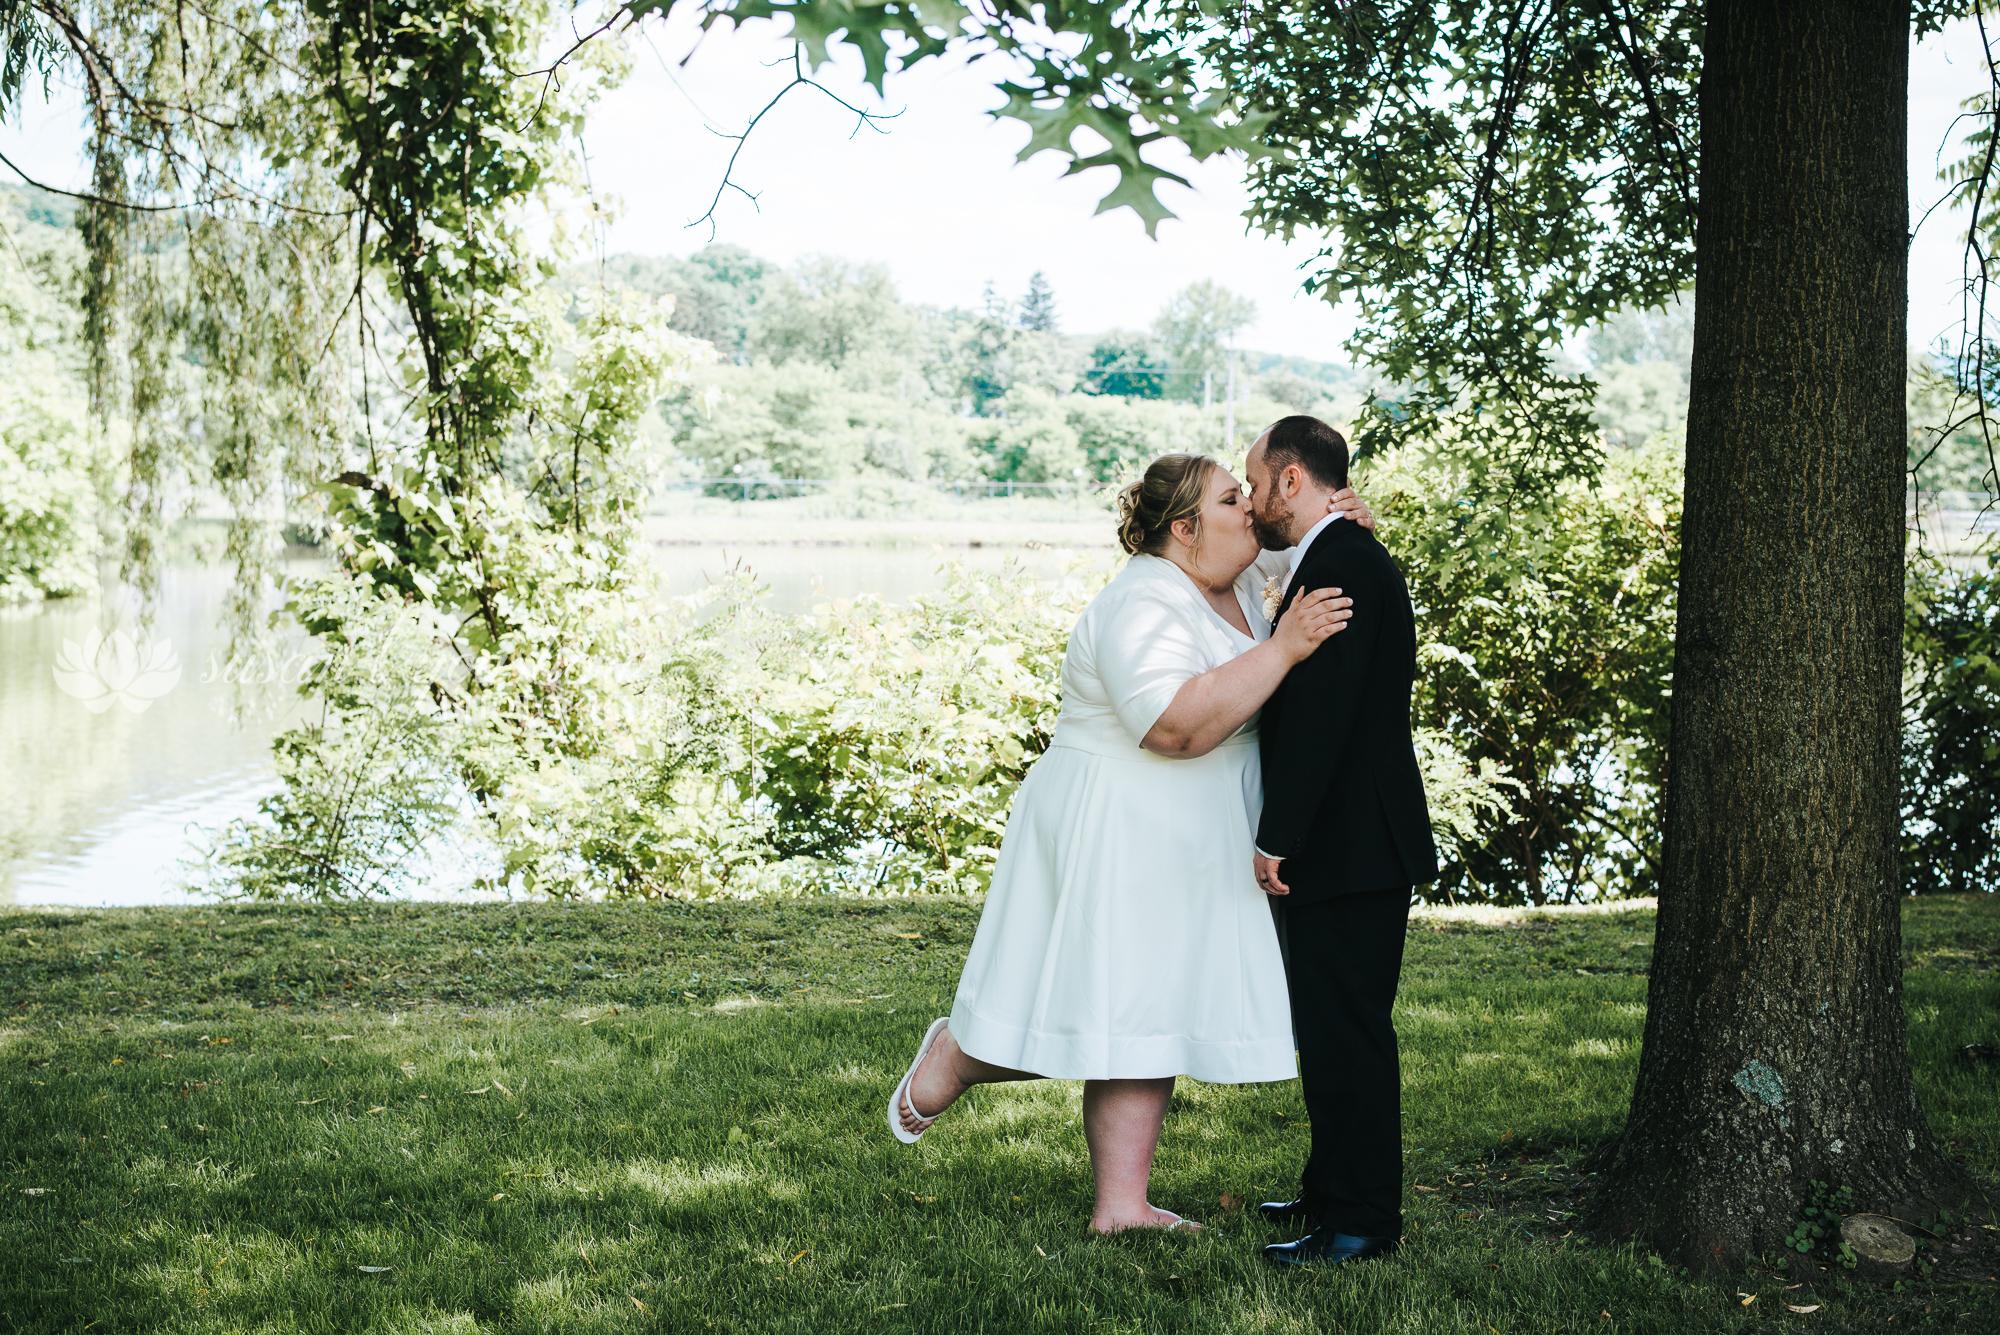 Bill and Sarah Wedding Photos 06-08-2019 SLY Photography -60.jpg